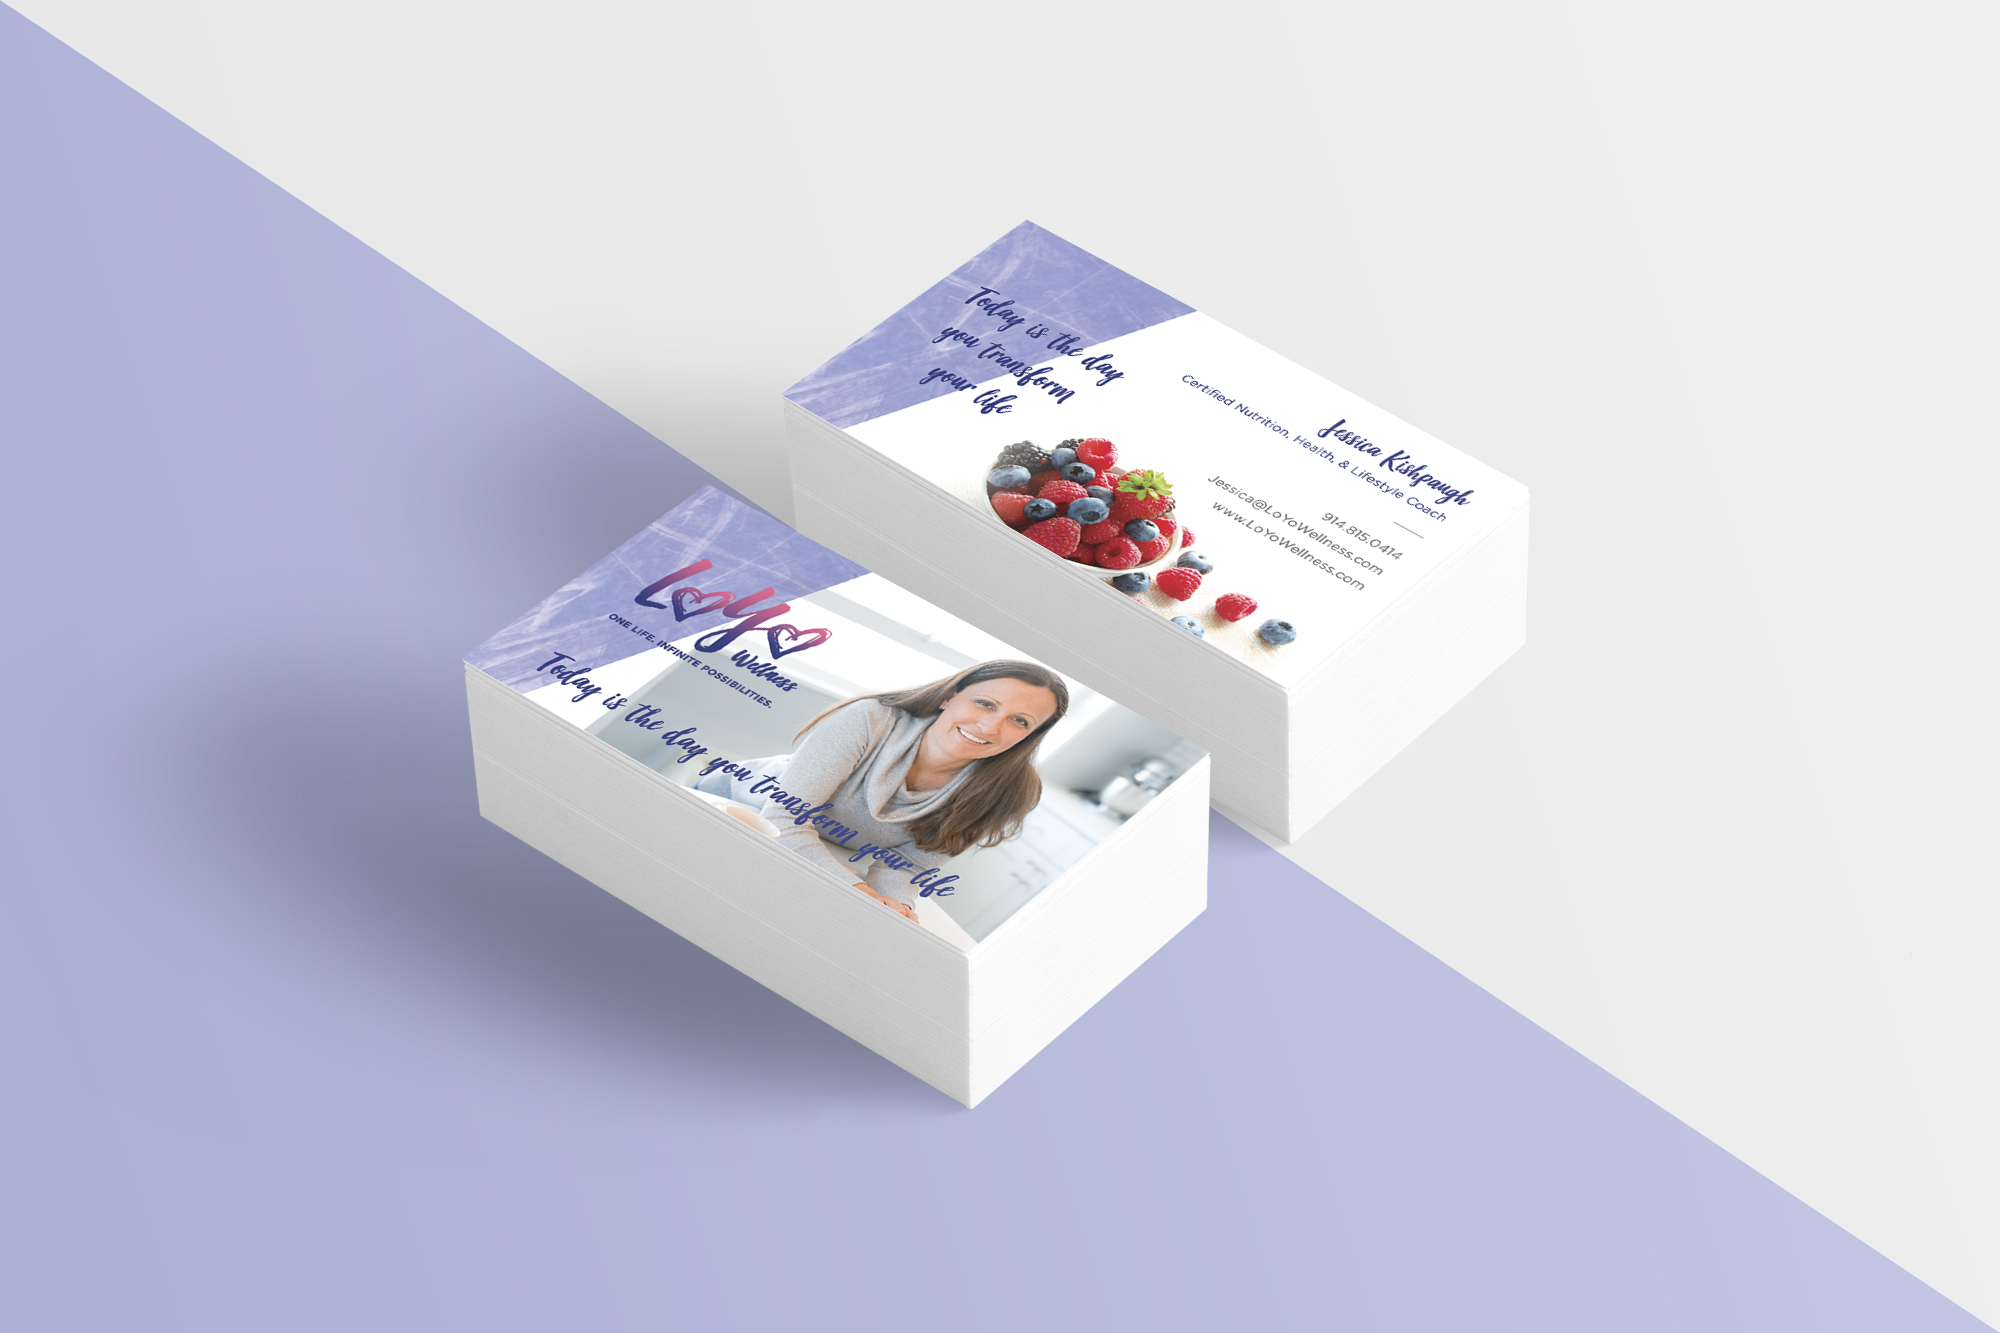 Loyo_business card_mockup.jpg